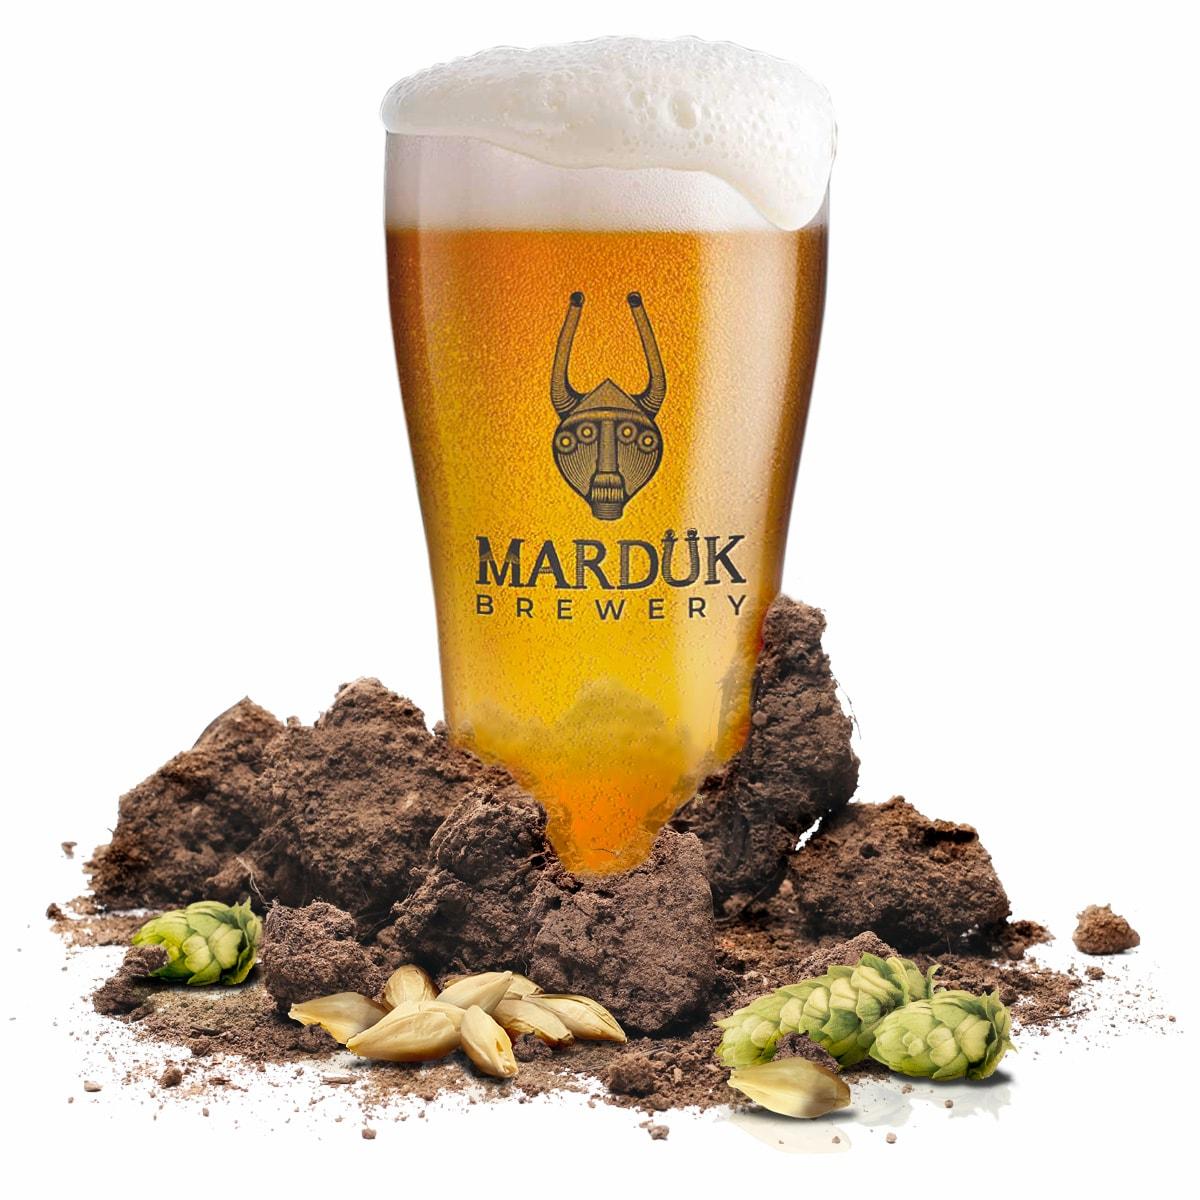 https://www.birrificiomarduk.com/wp-content/uploads/2020/06/04-marduk-brewery-agricoltura-filiera-materie-prime-birrificio-birre.jpg